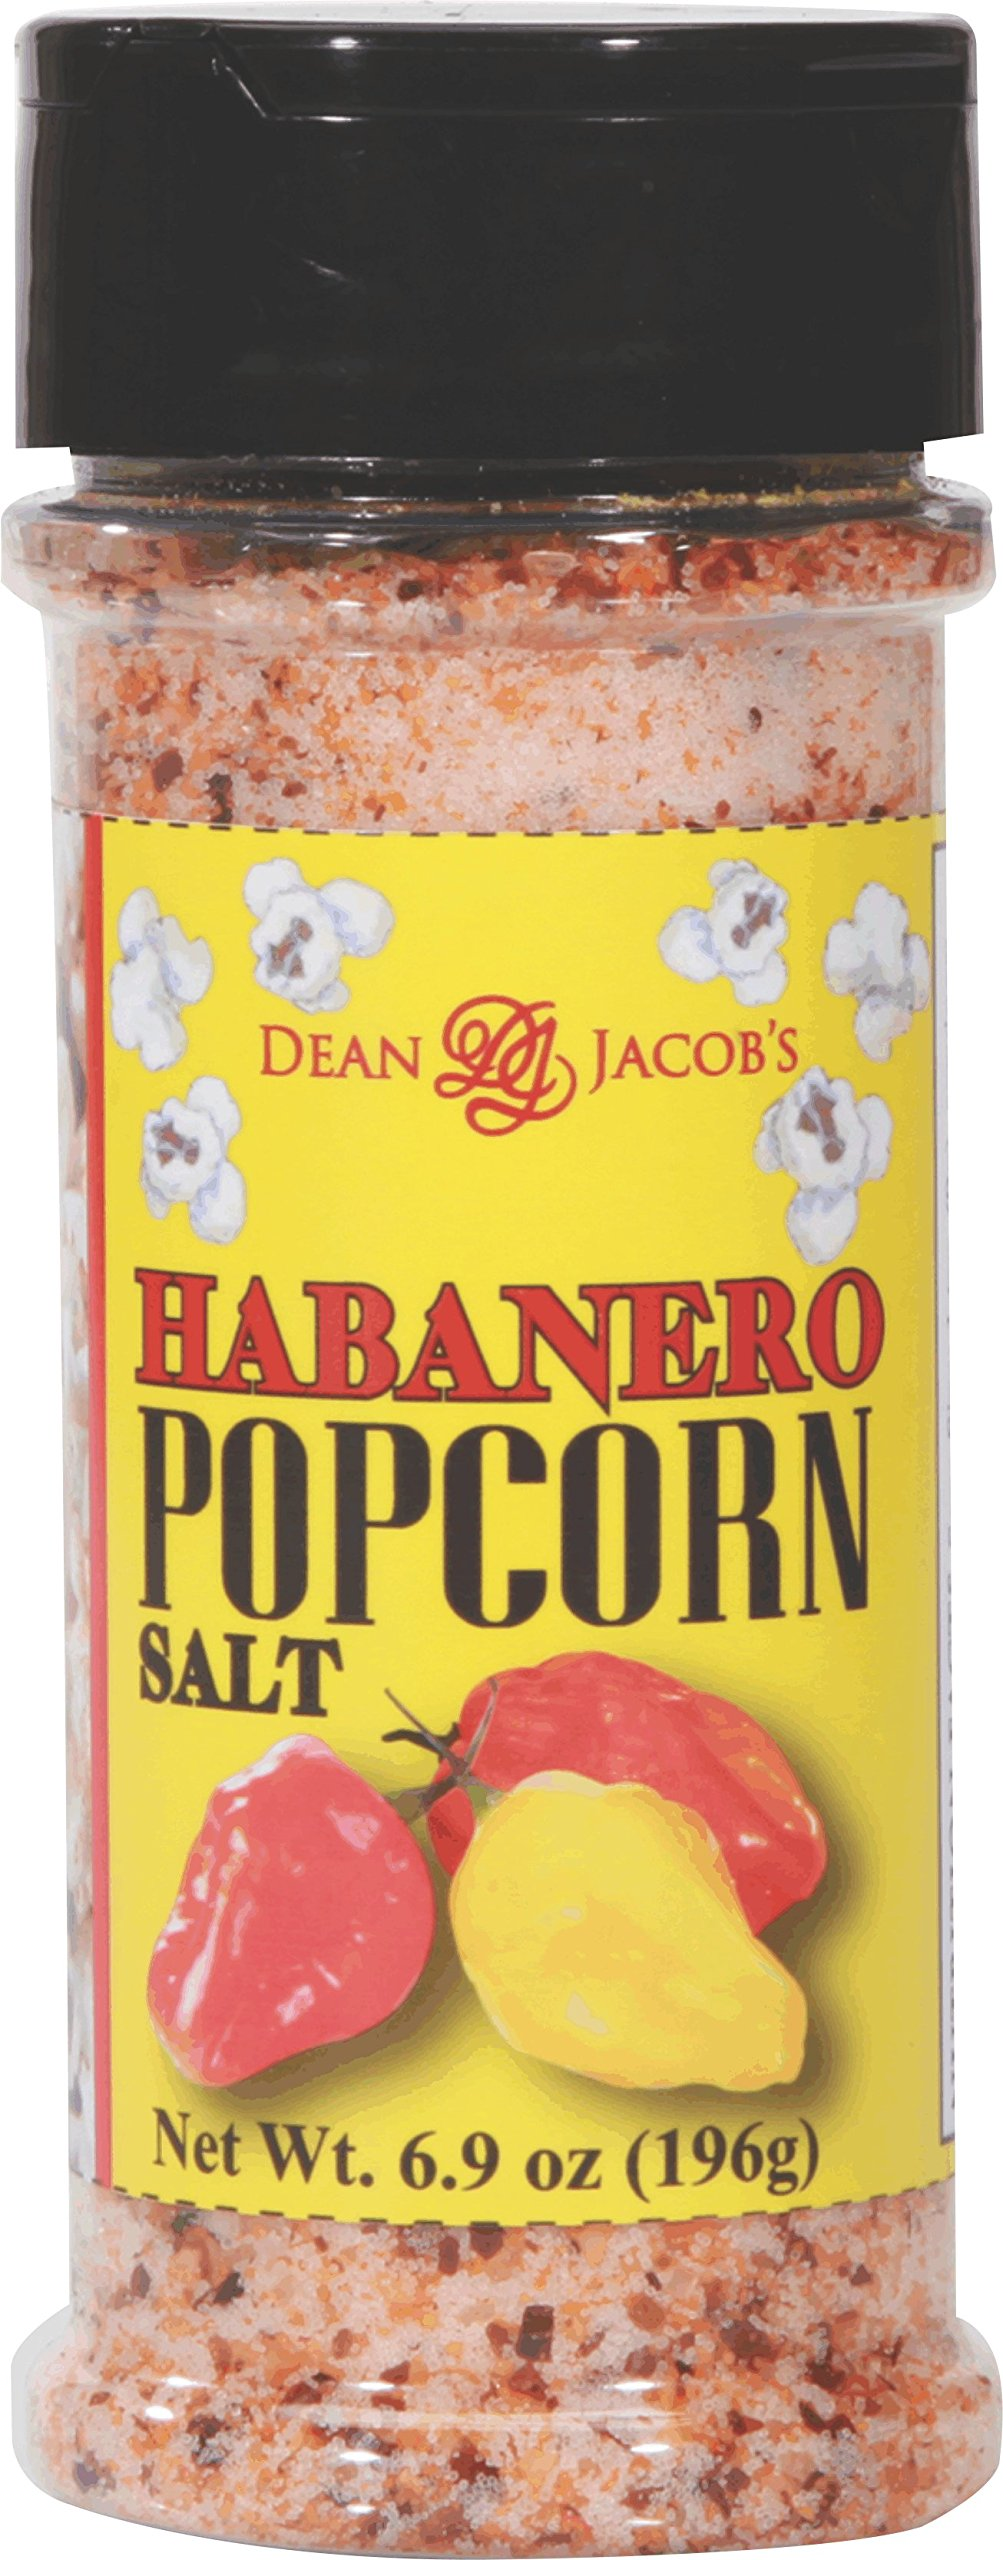 Dean Jacob's Habanero Popcorn Salt